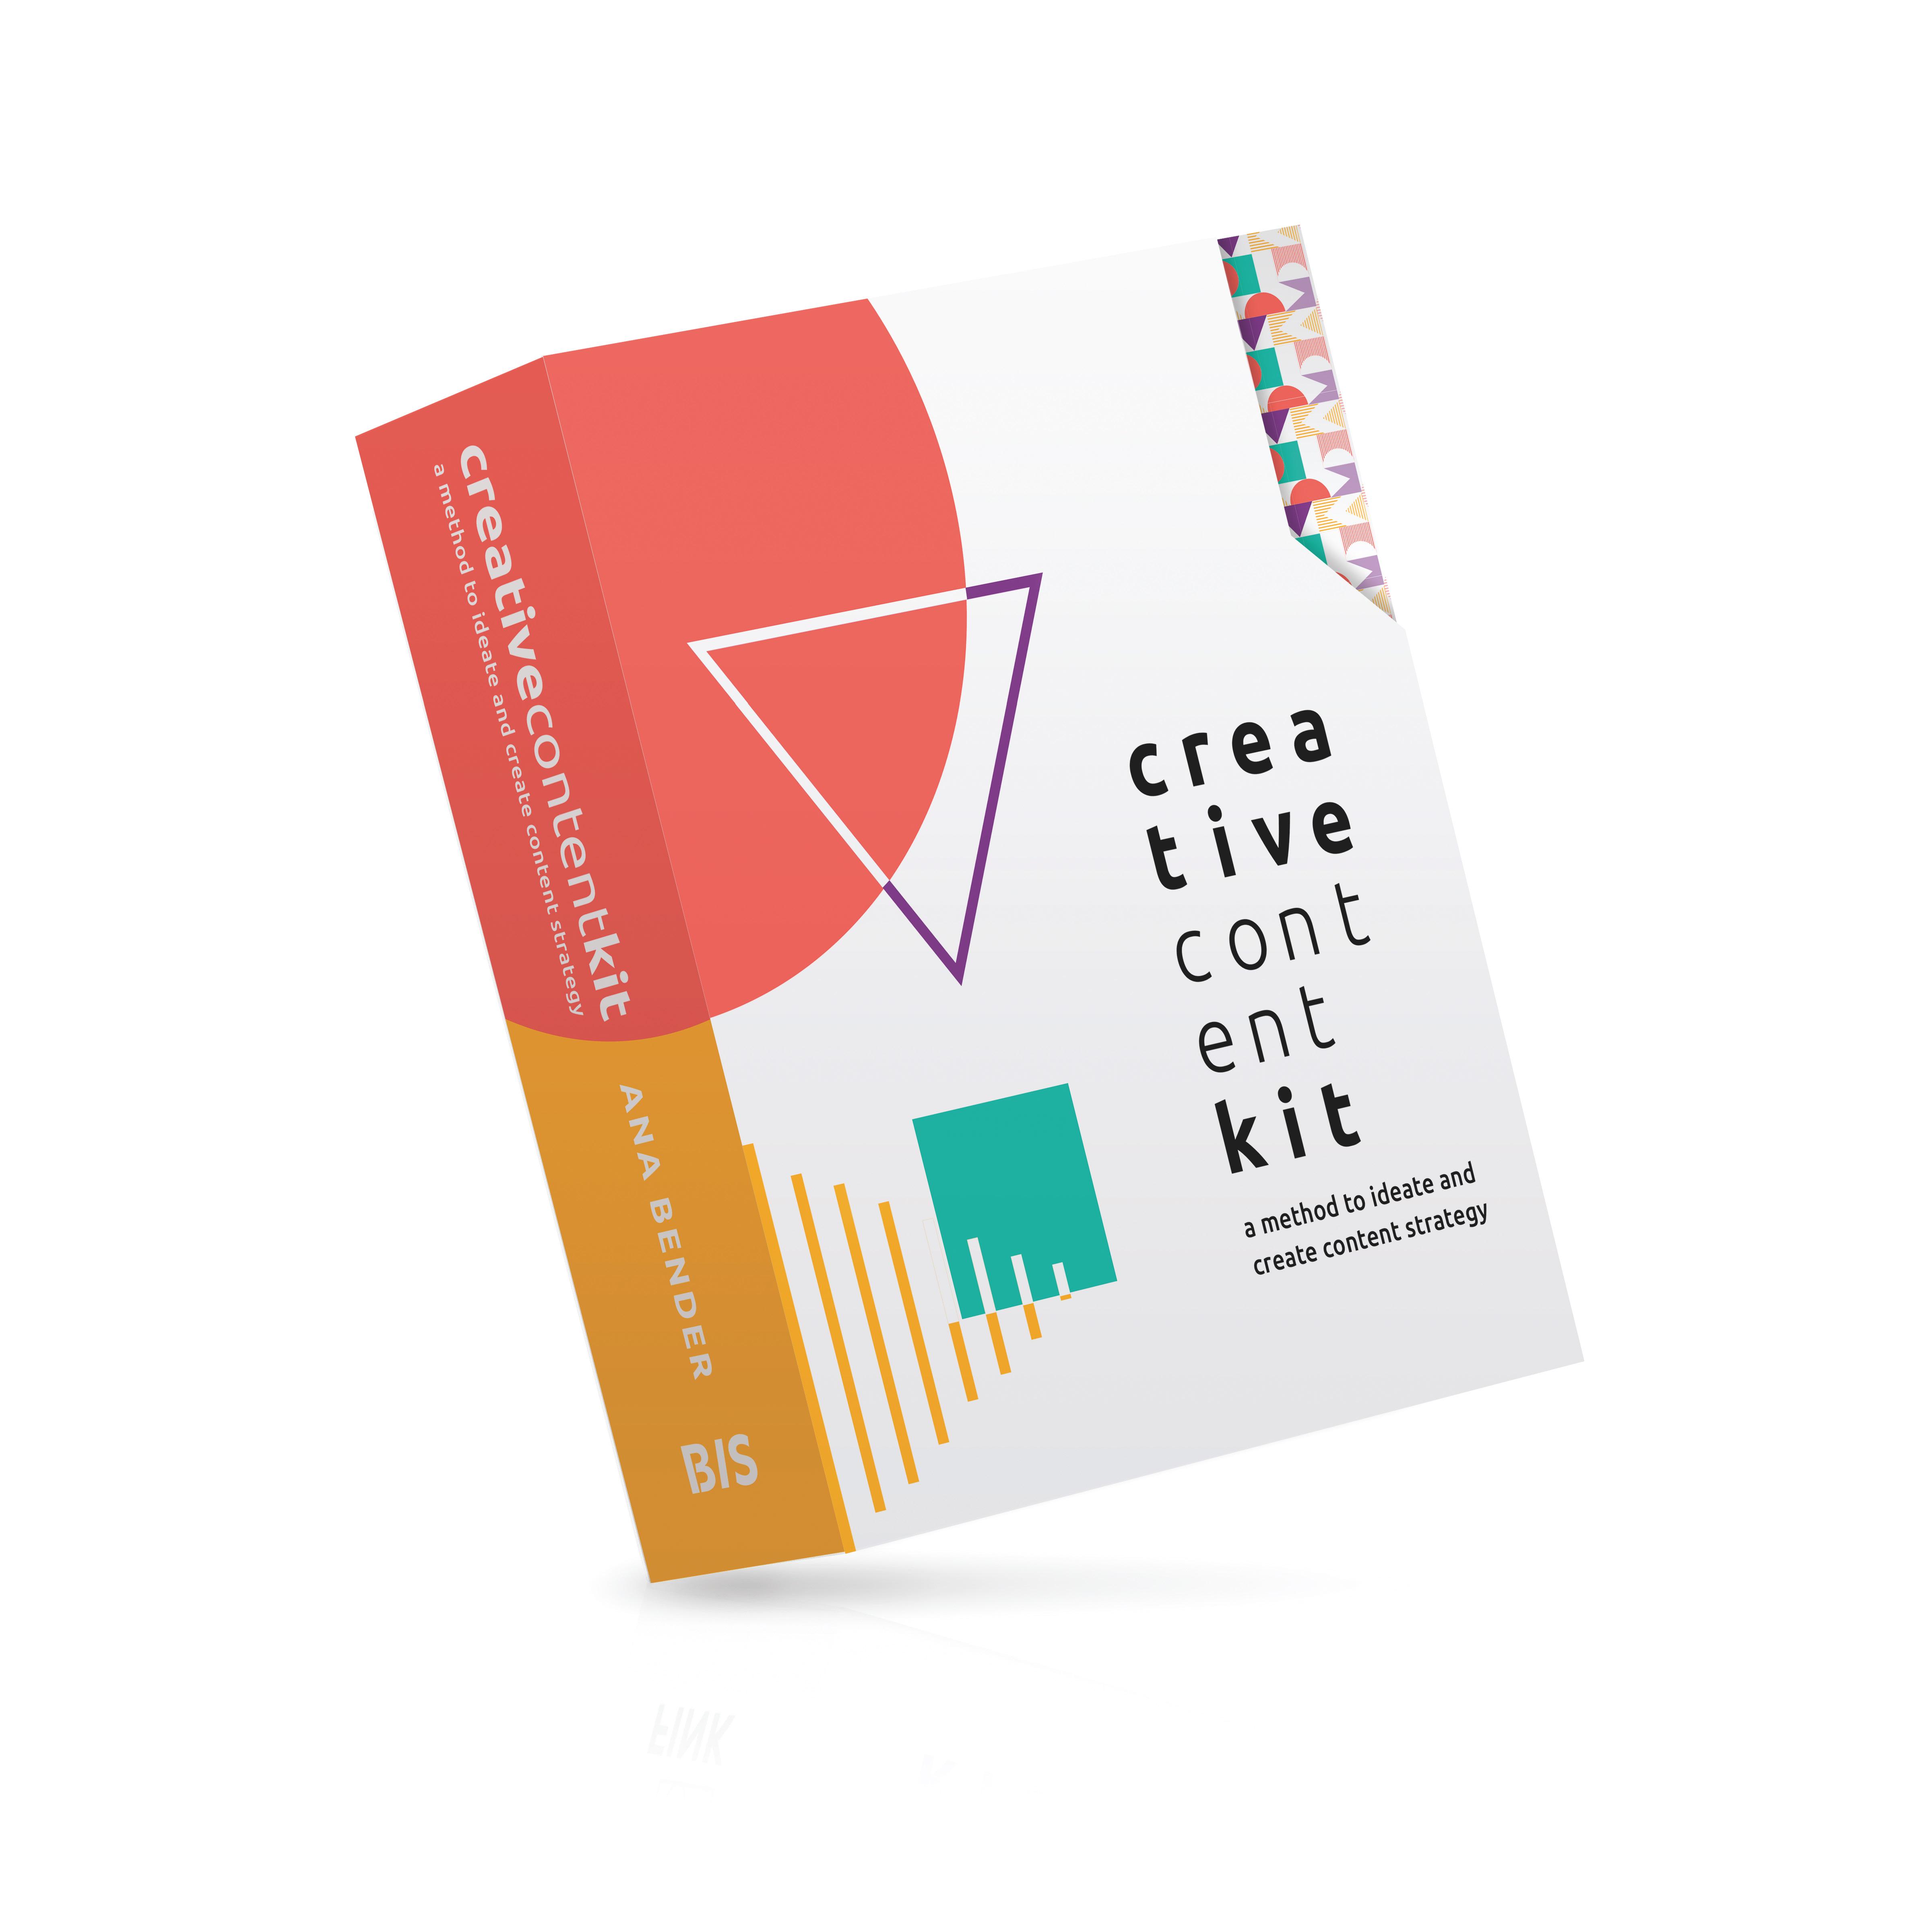 Creative Content Kit - Product Thumbnail